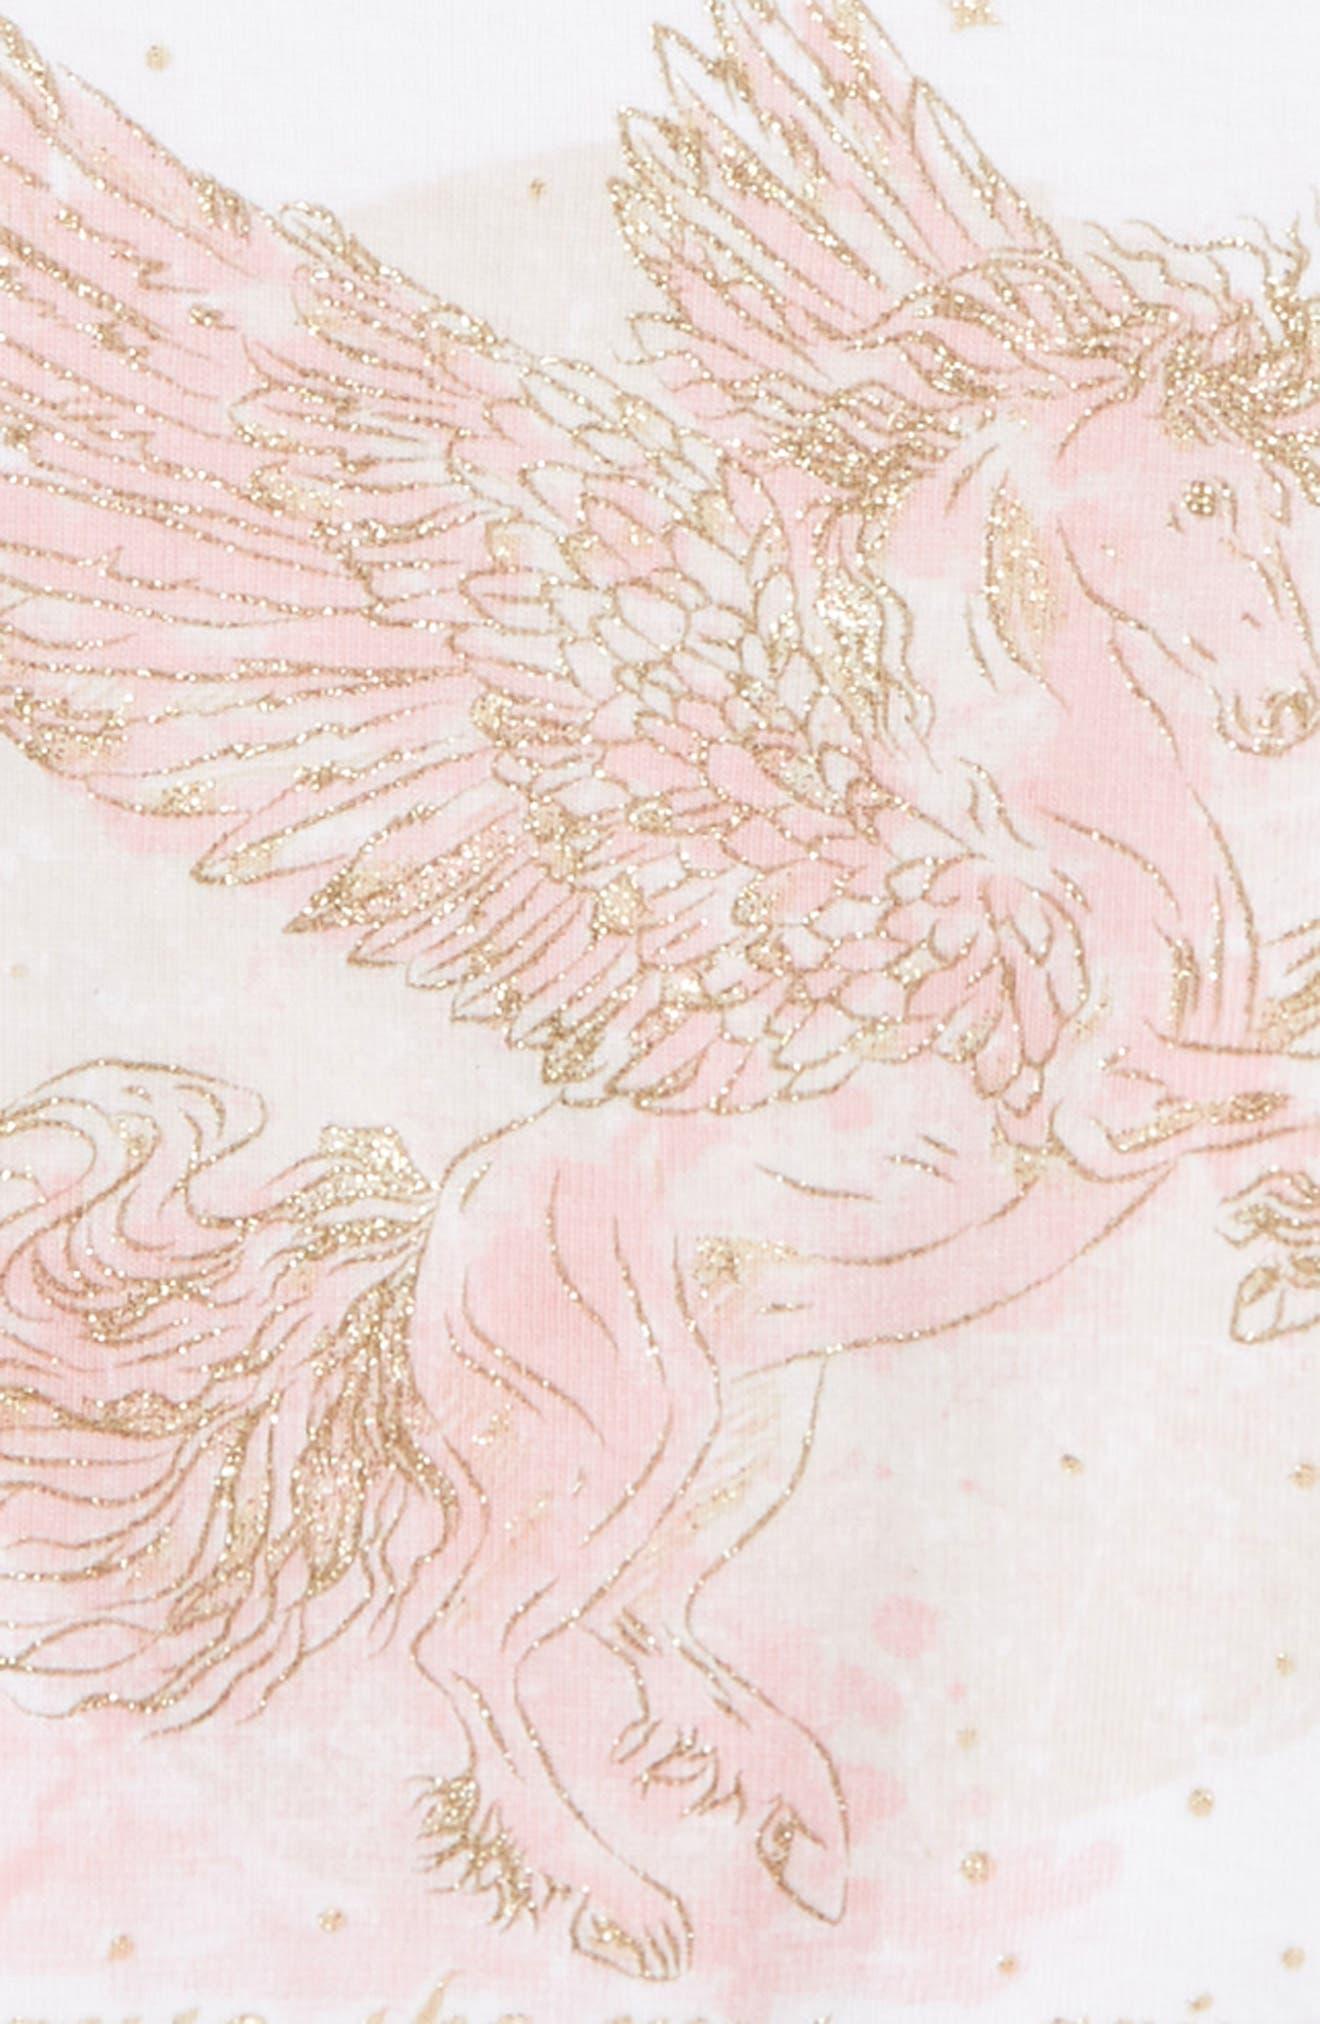 Pegasus Organic Cotton Tee,                             Alternate thumbnail 2, color,                             100